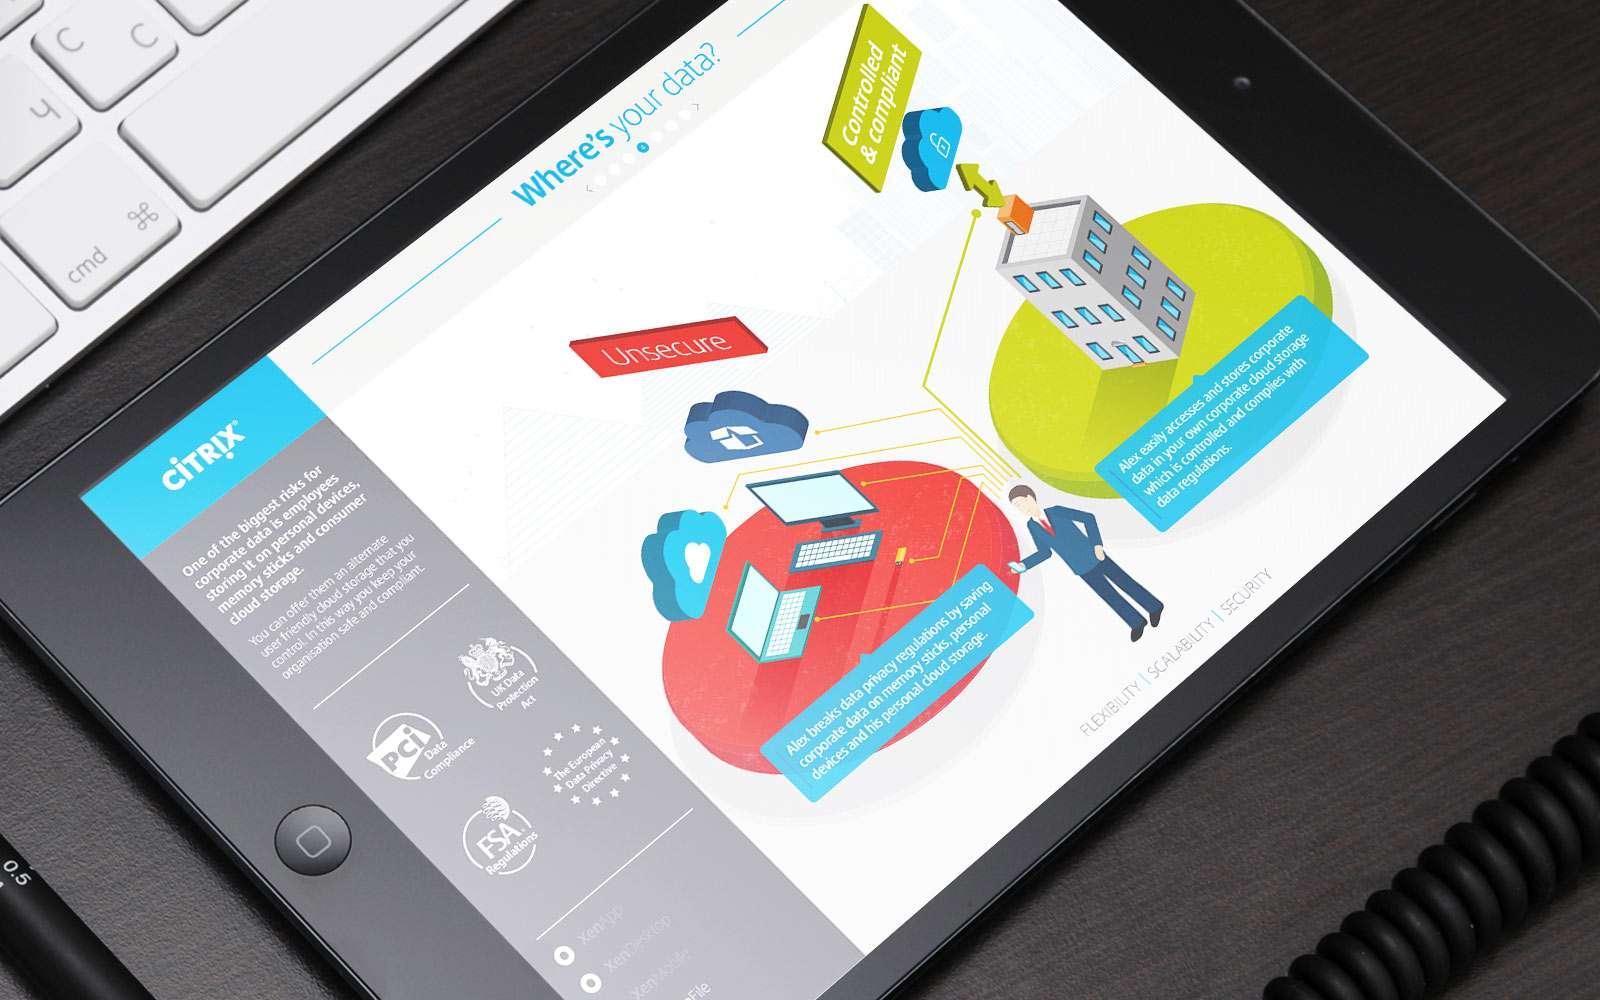 Black iPad displaying Citrix interactive touchscreen sales enablement tool on desk amongst keypad